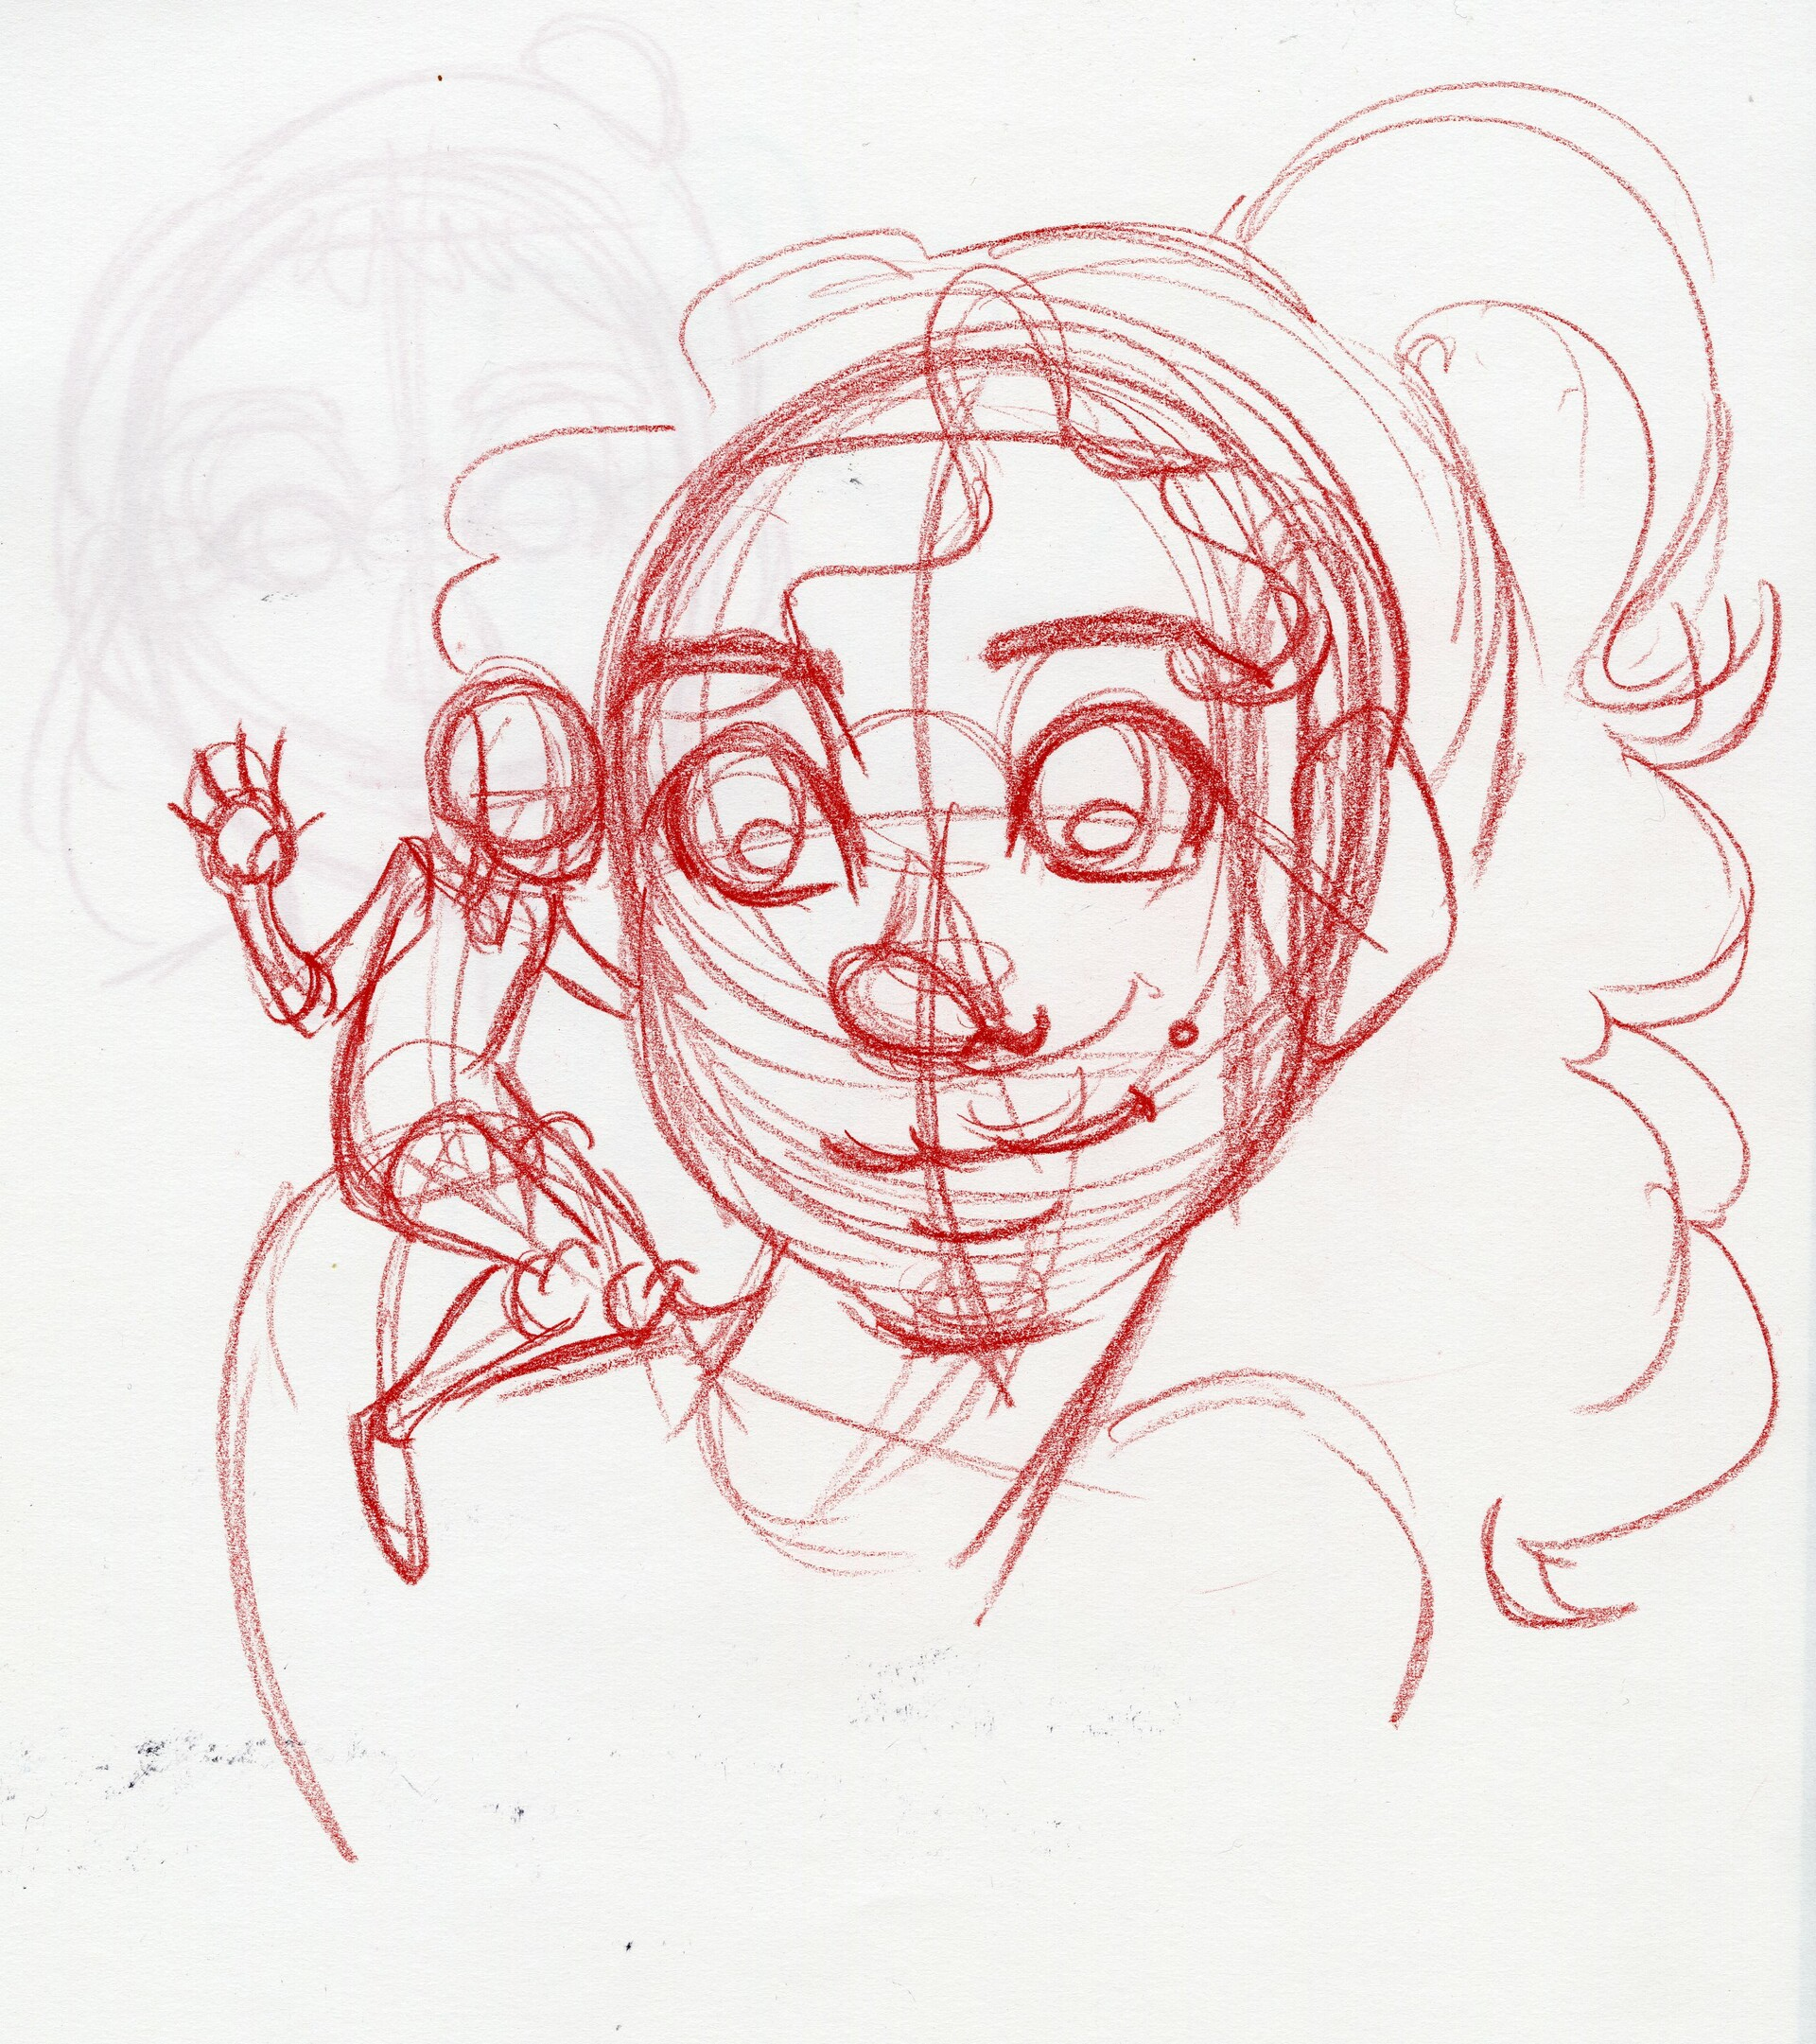 Original thumbnail sketch